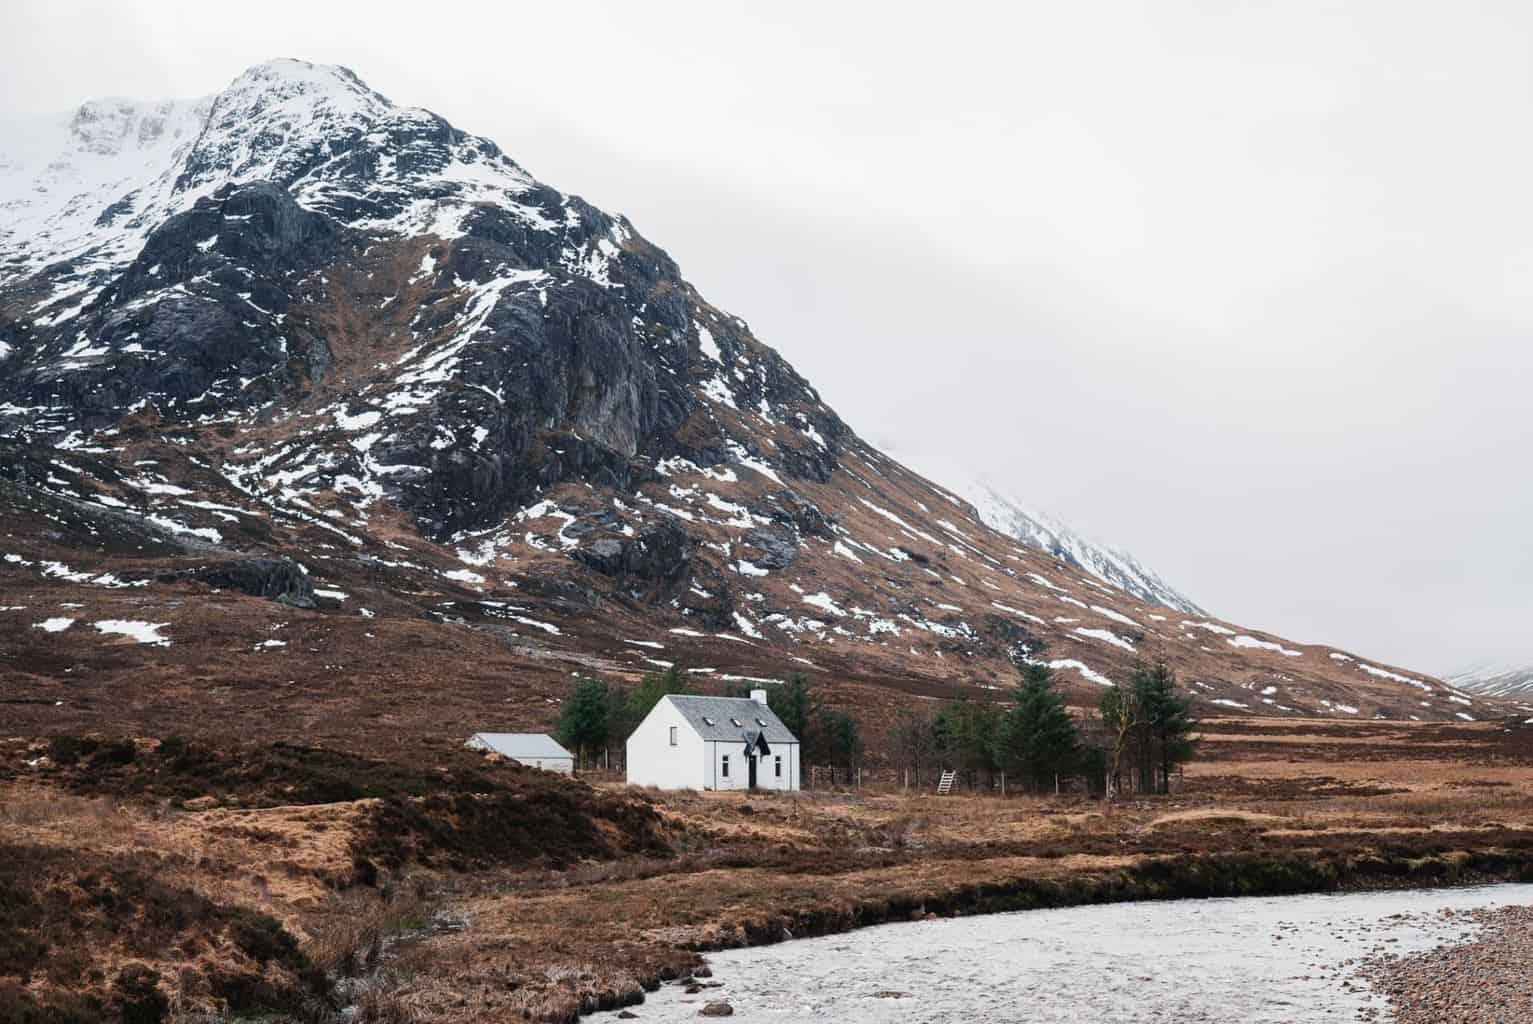 north coast 500 road trip scottish highlands